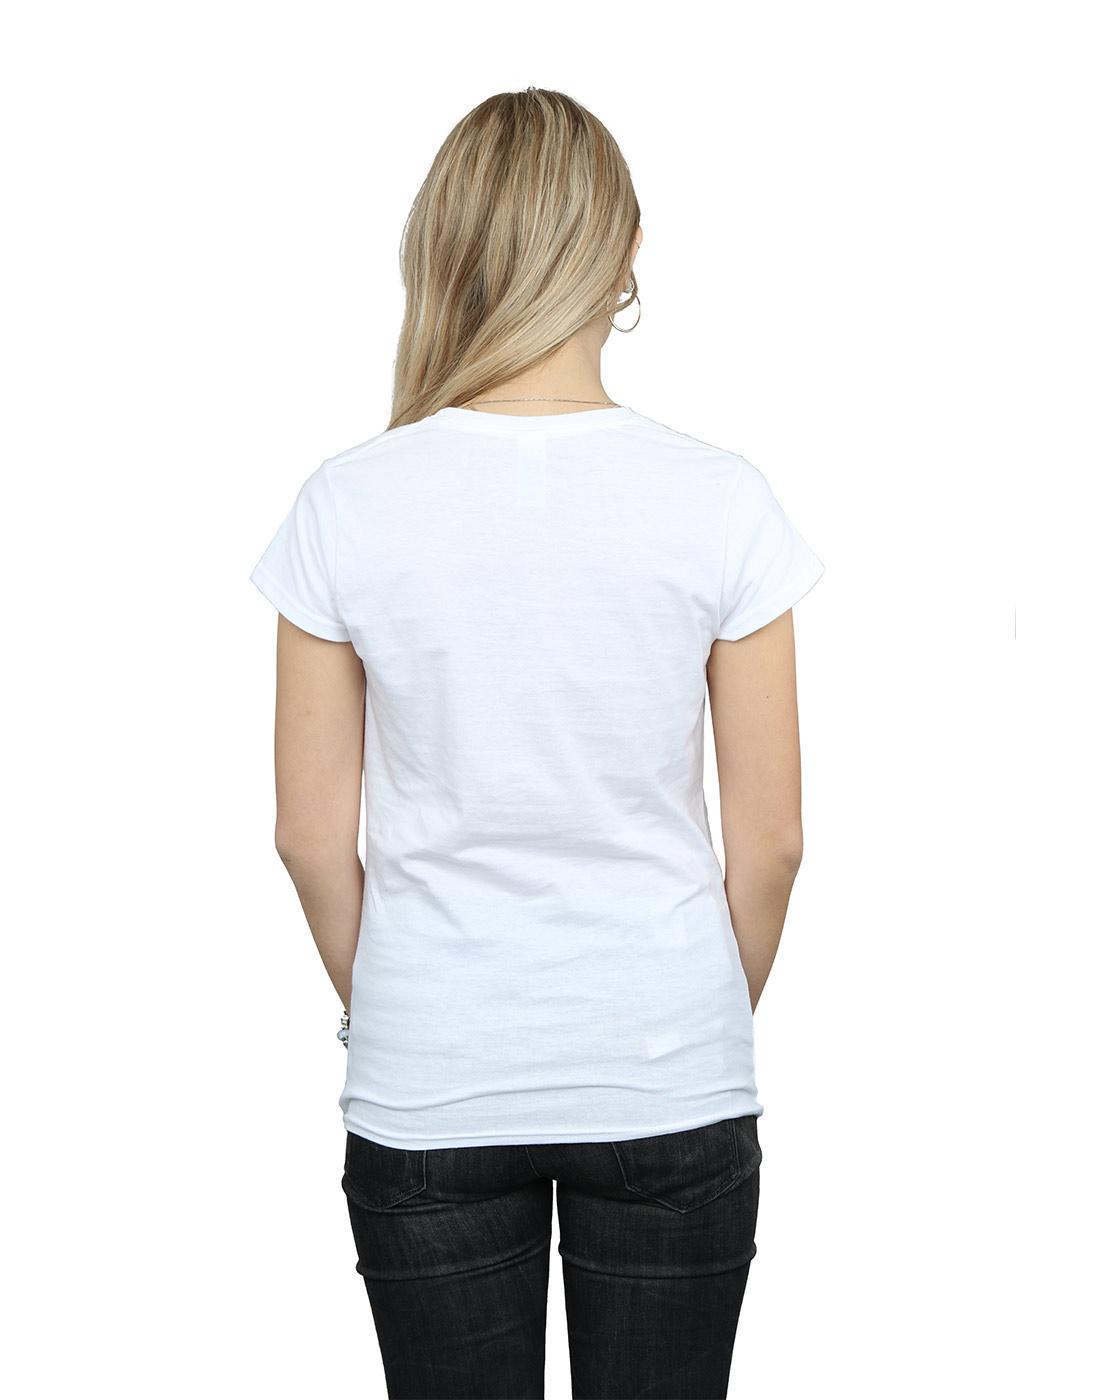 Marvel-Women-039-s-Deadpool-Seriously-T-Shirt-White-XX-Large